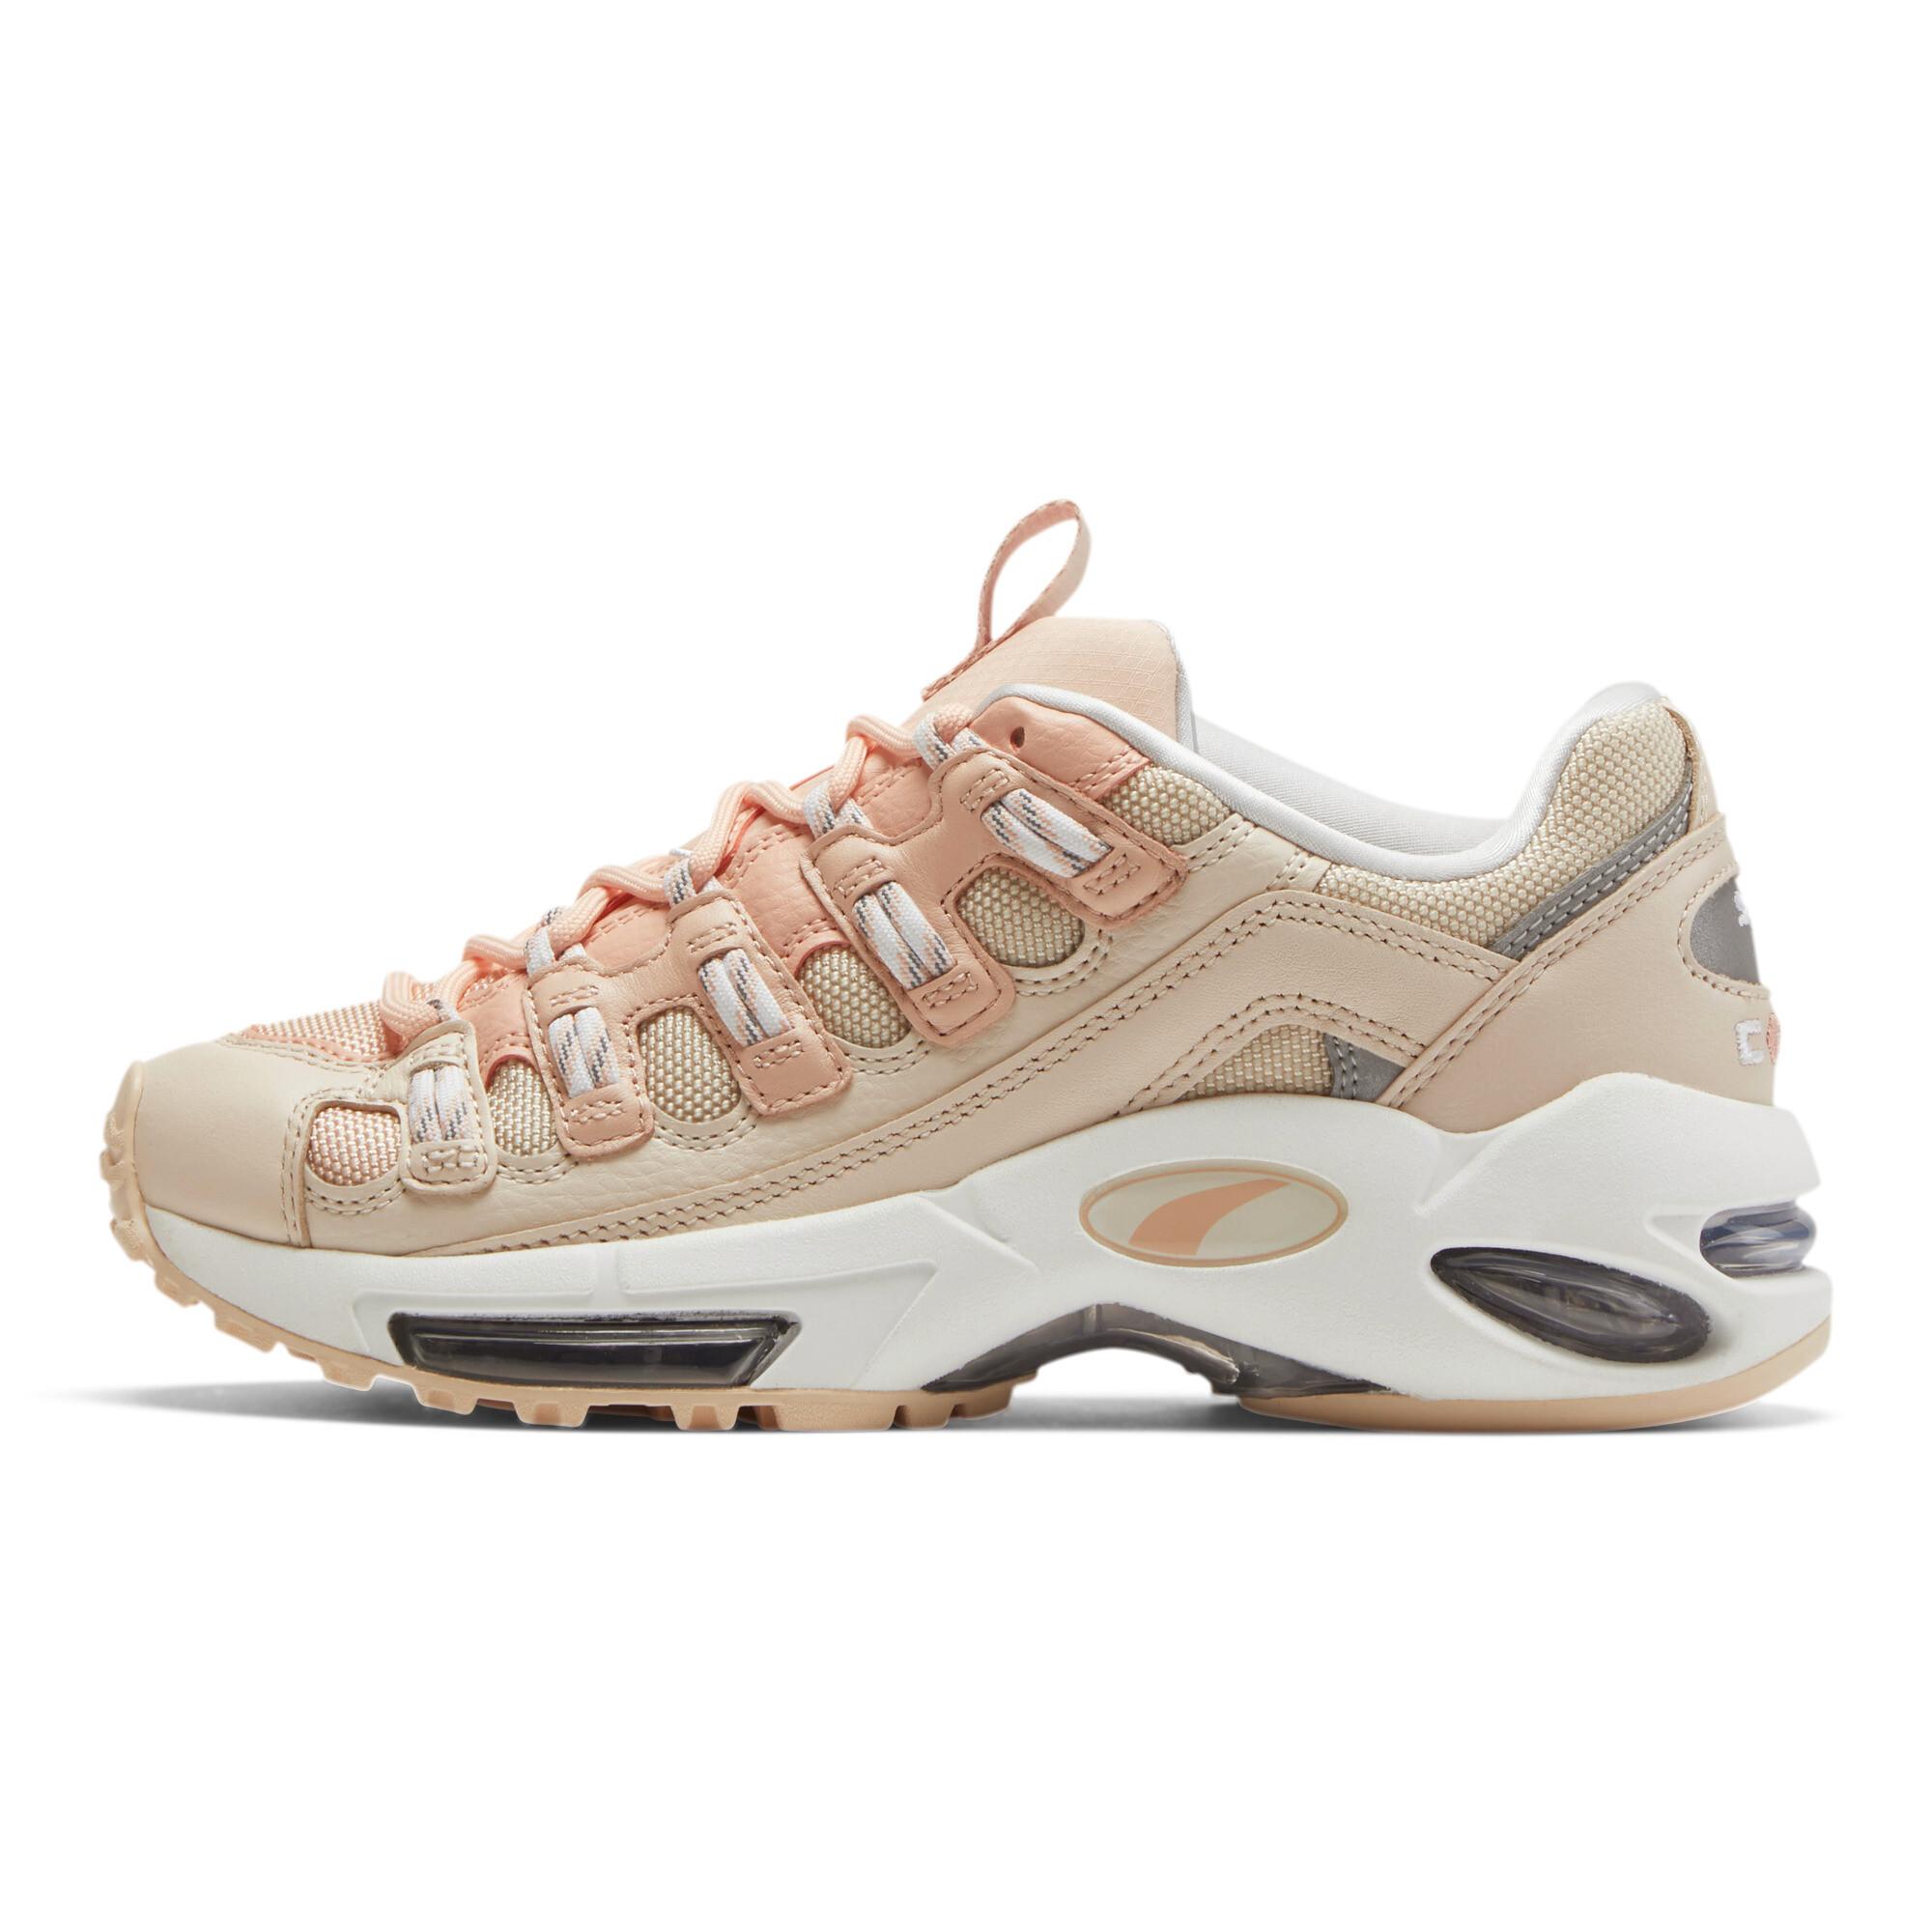 PUMA-CELL-Endura-Rebound-Women-039-s-Sneakers-Women-Shoe-Sport-Classics thumbnail 10